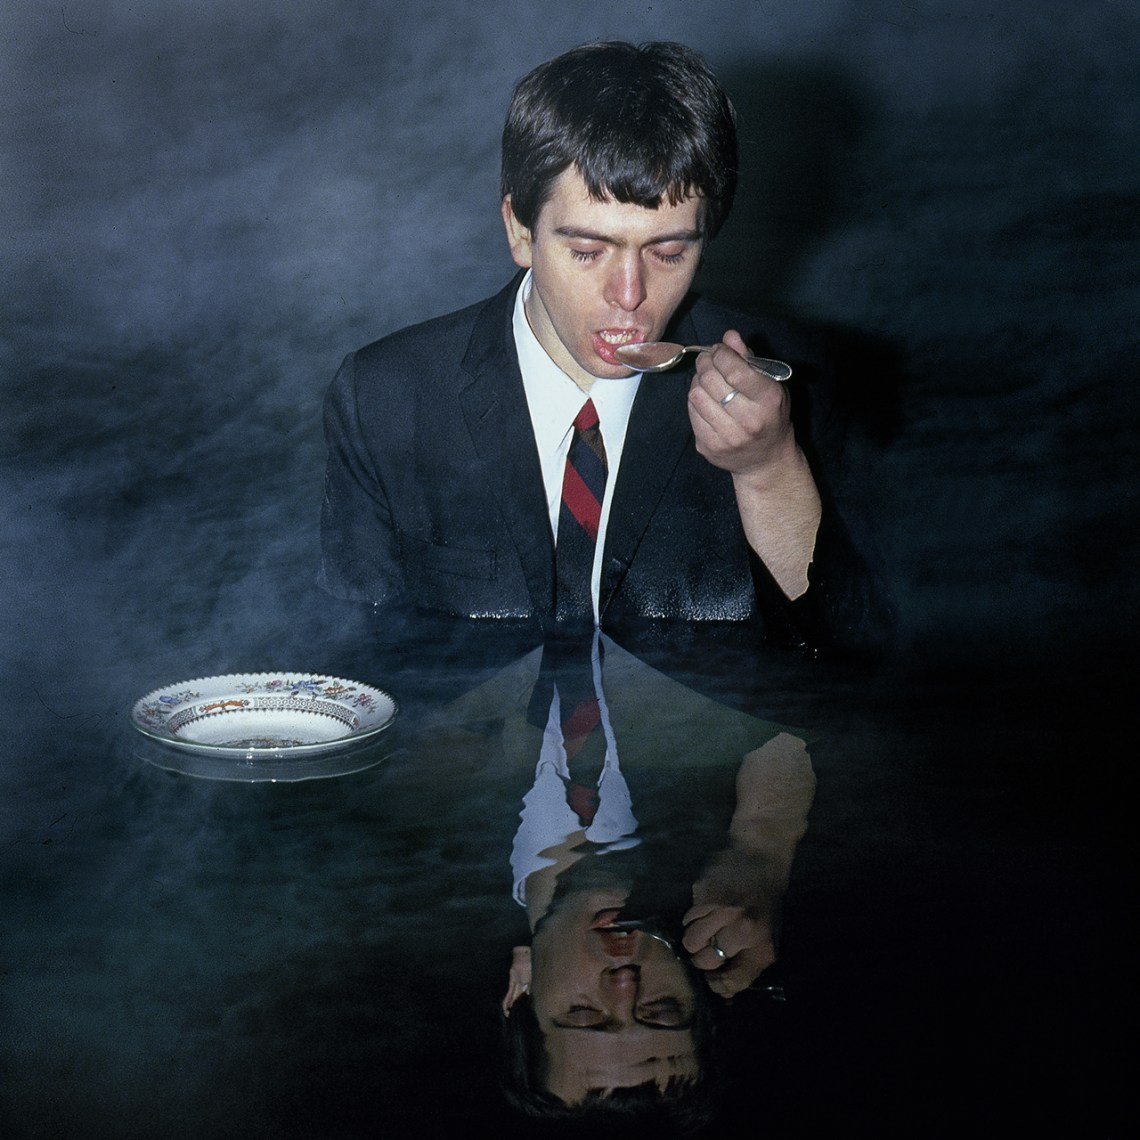 Peter-Gabriel-Soup.Bath.Arrowsmith.208.jpg